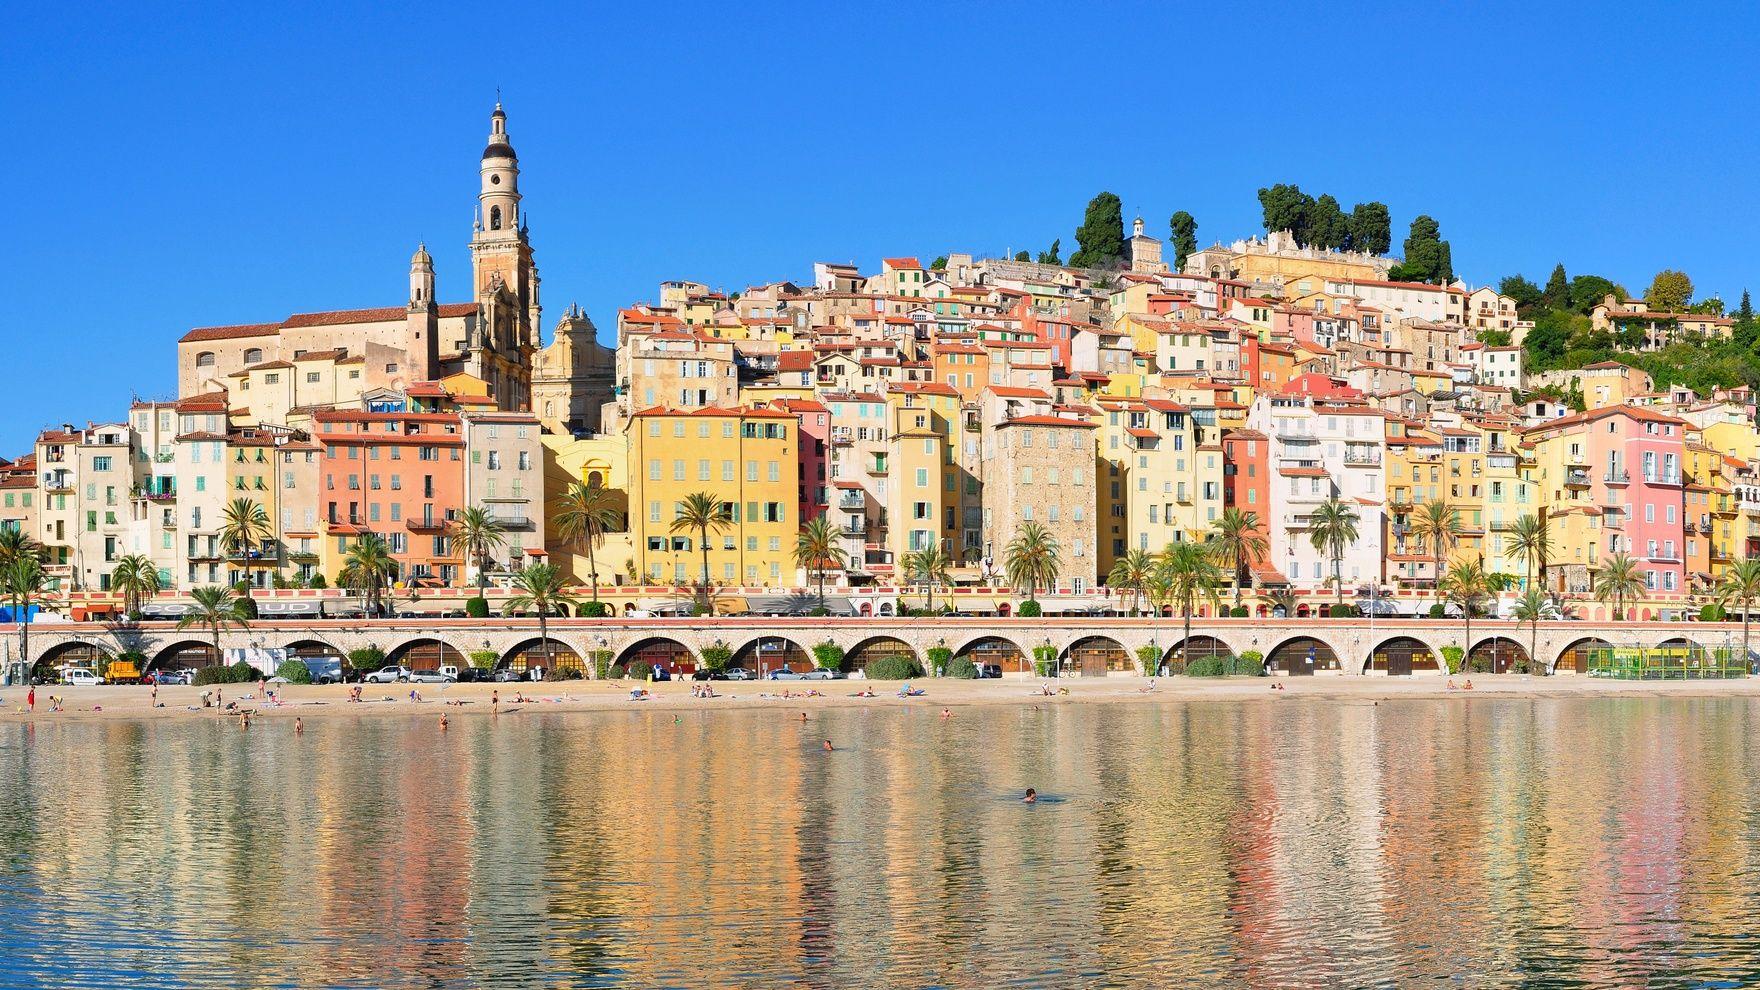 Cote d'Azur — Liguria — Tuscany crossing